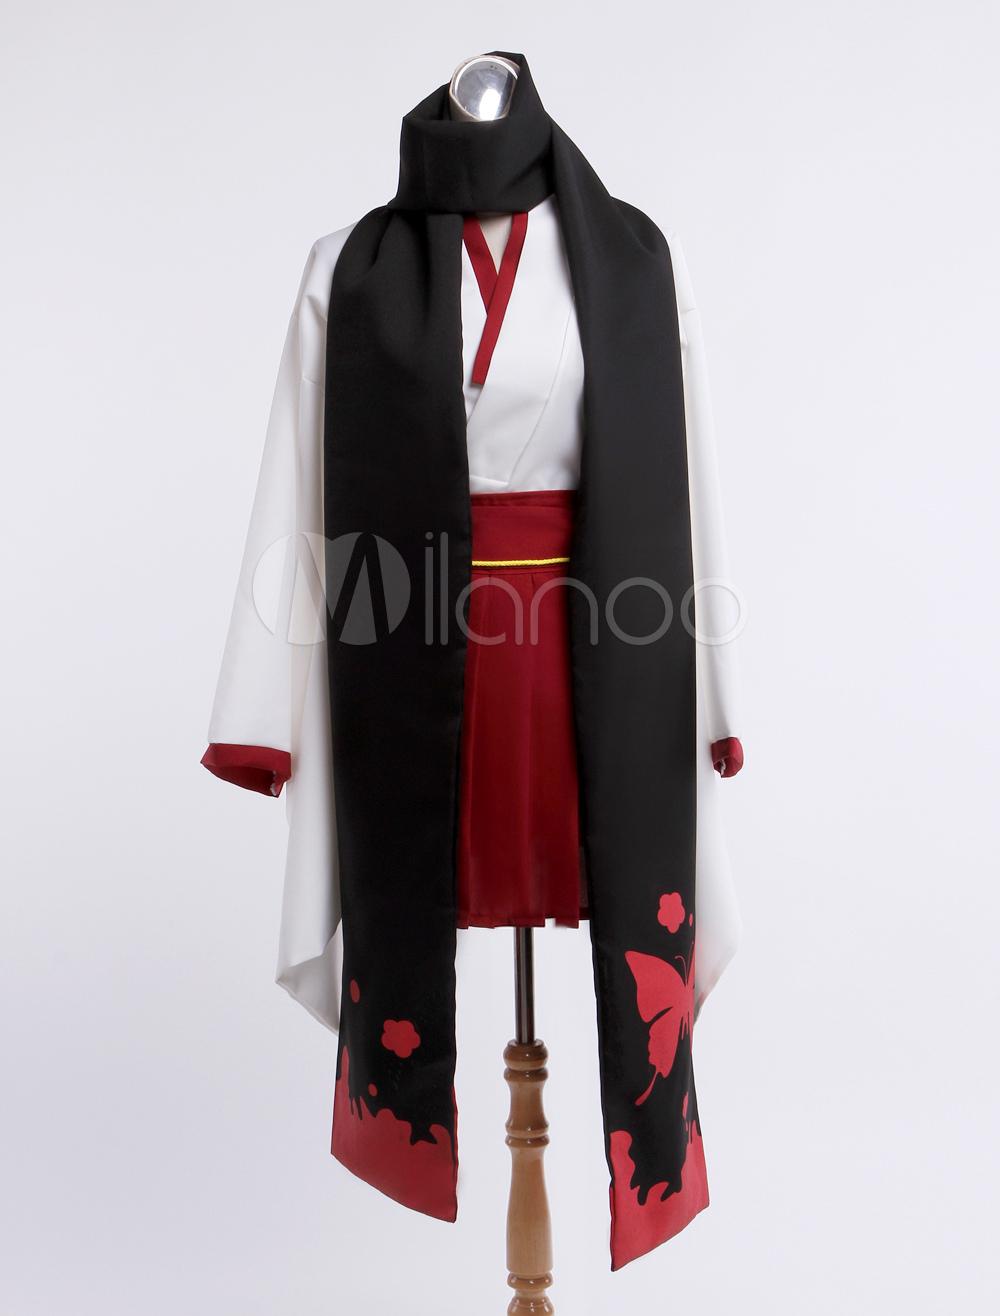 Inu x Boku SS Shirakiin Ririchiyo Cosplay Costume Halloween